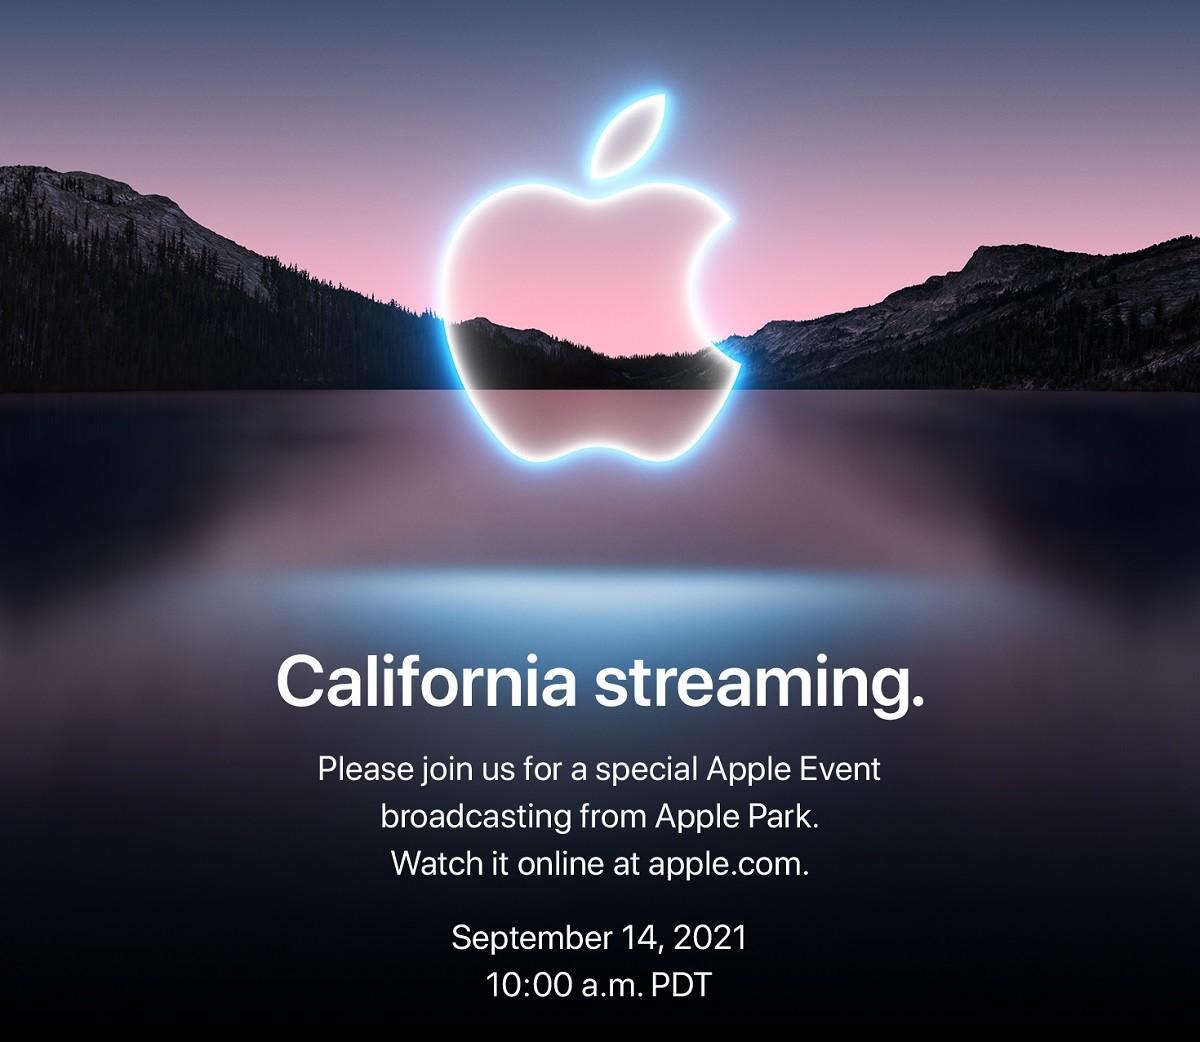 照片中提到了California streaming.、Please join us for a special Apple Event、broadcasting from Apple Park.,跟蘋果公司。有關,包含了優勝美地國家公園、尼雪平校區、優勝美地國家公園、水資源、牆紙